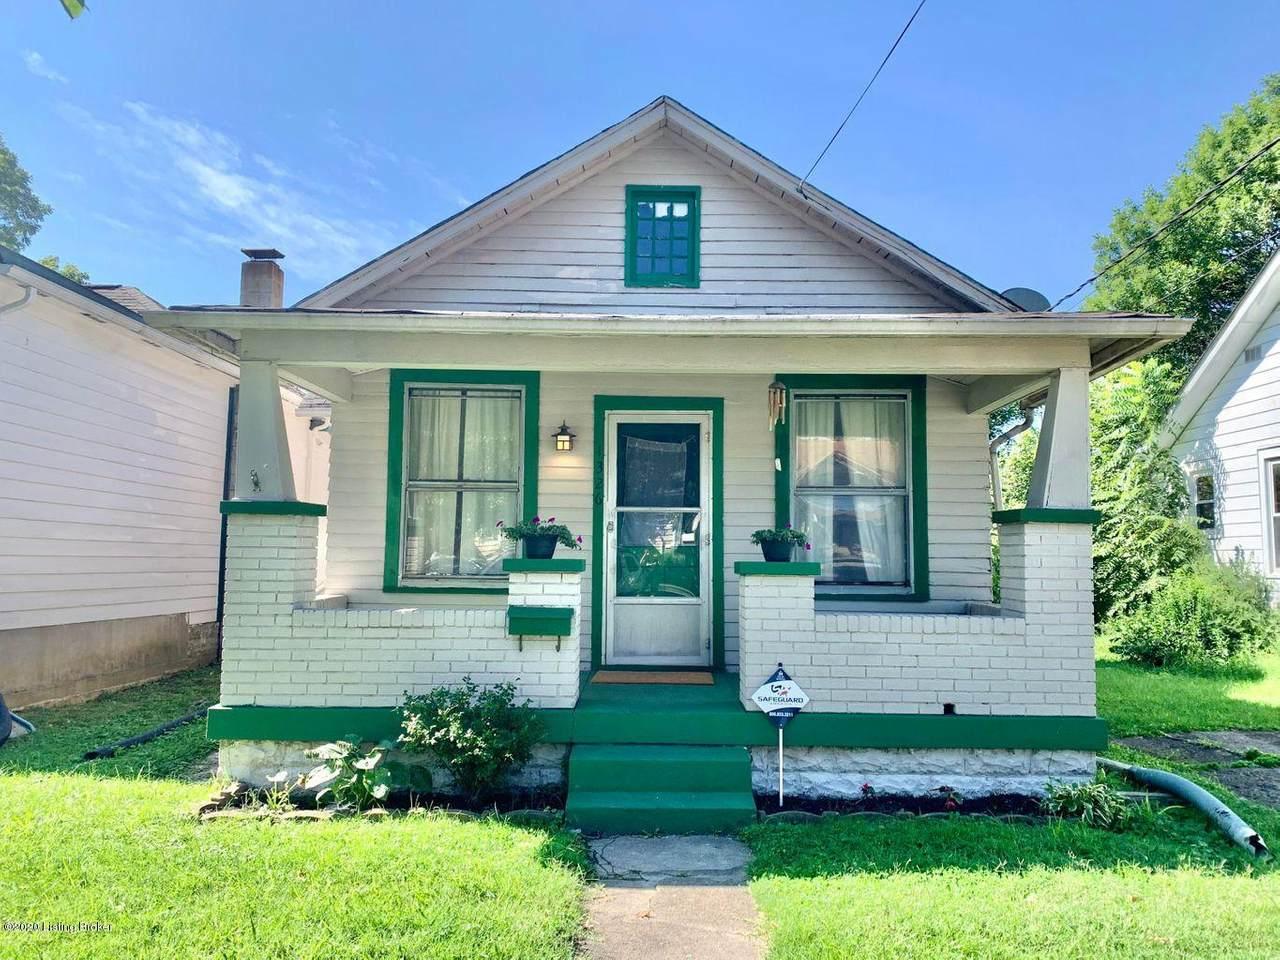 1326 Sale Ave - Photo 1